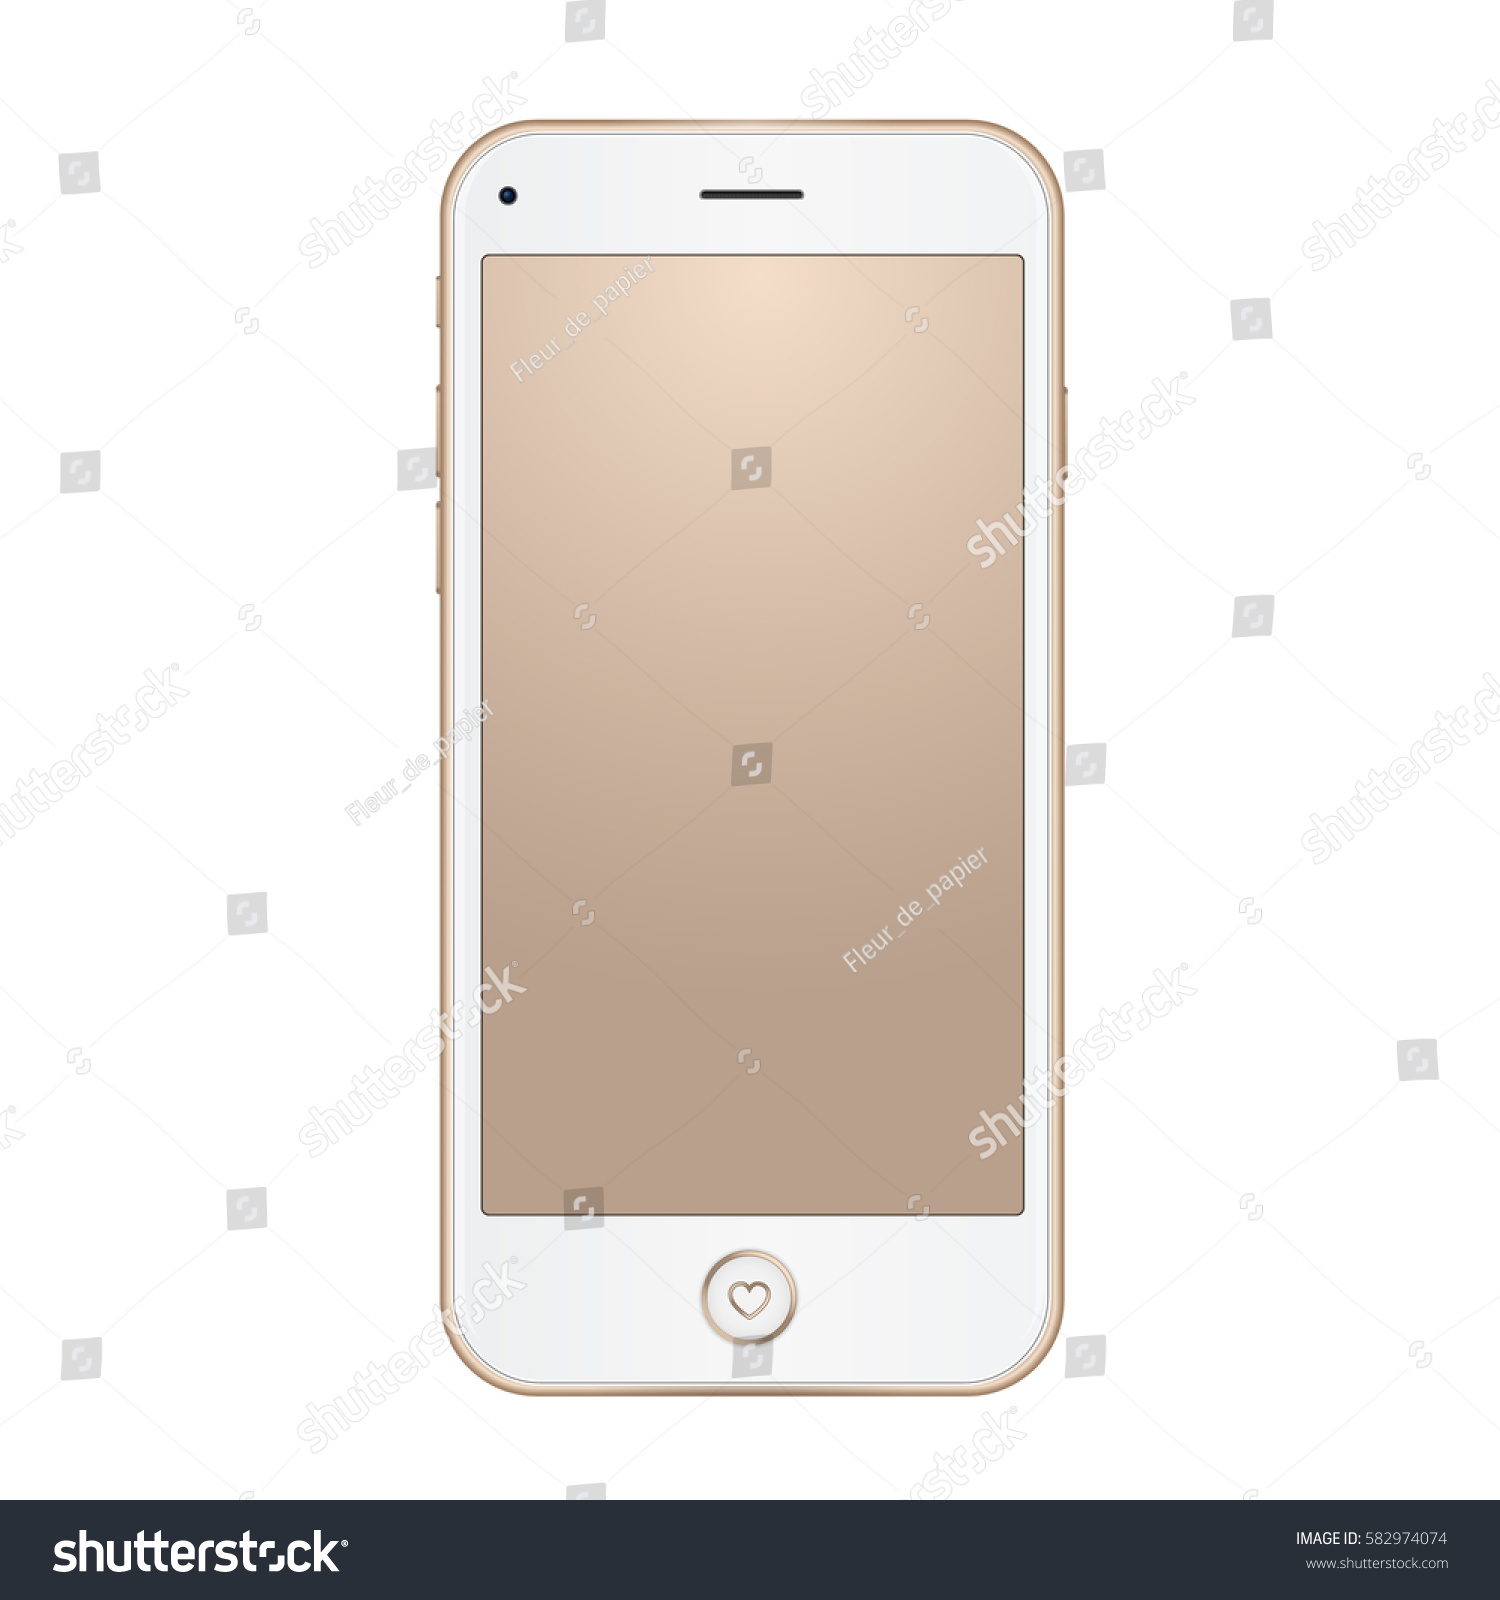 vector gold frame mobile phone empty stock vector 582974074 shutterstock. Black Bedroom Furniture Sets. Home Design Ideas